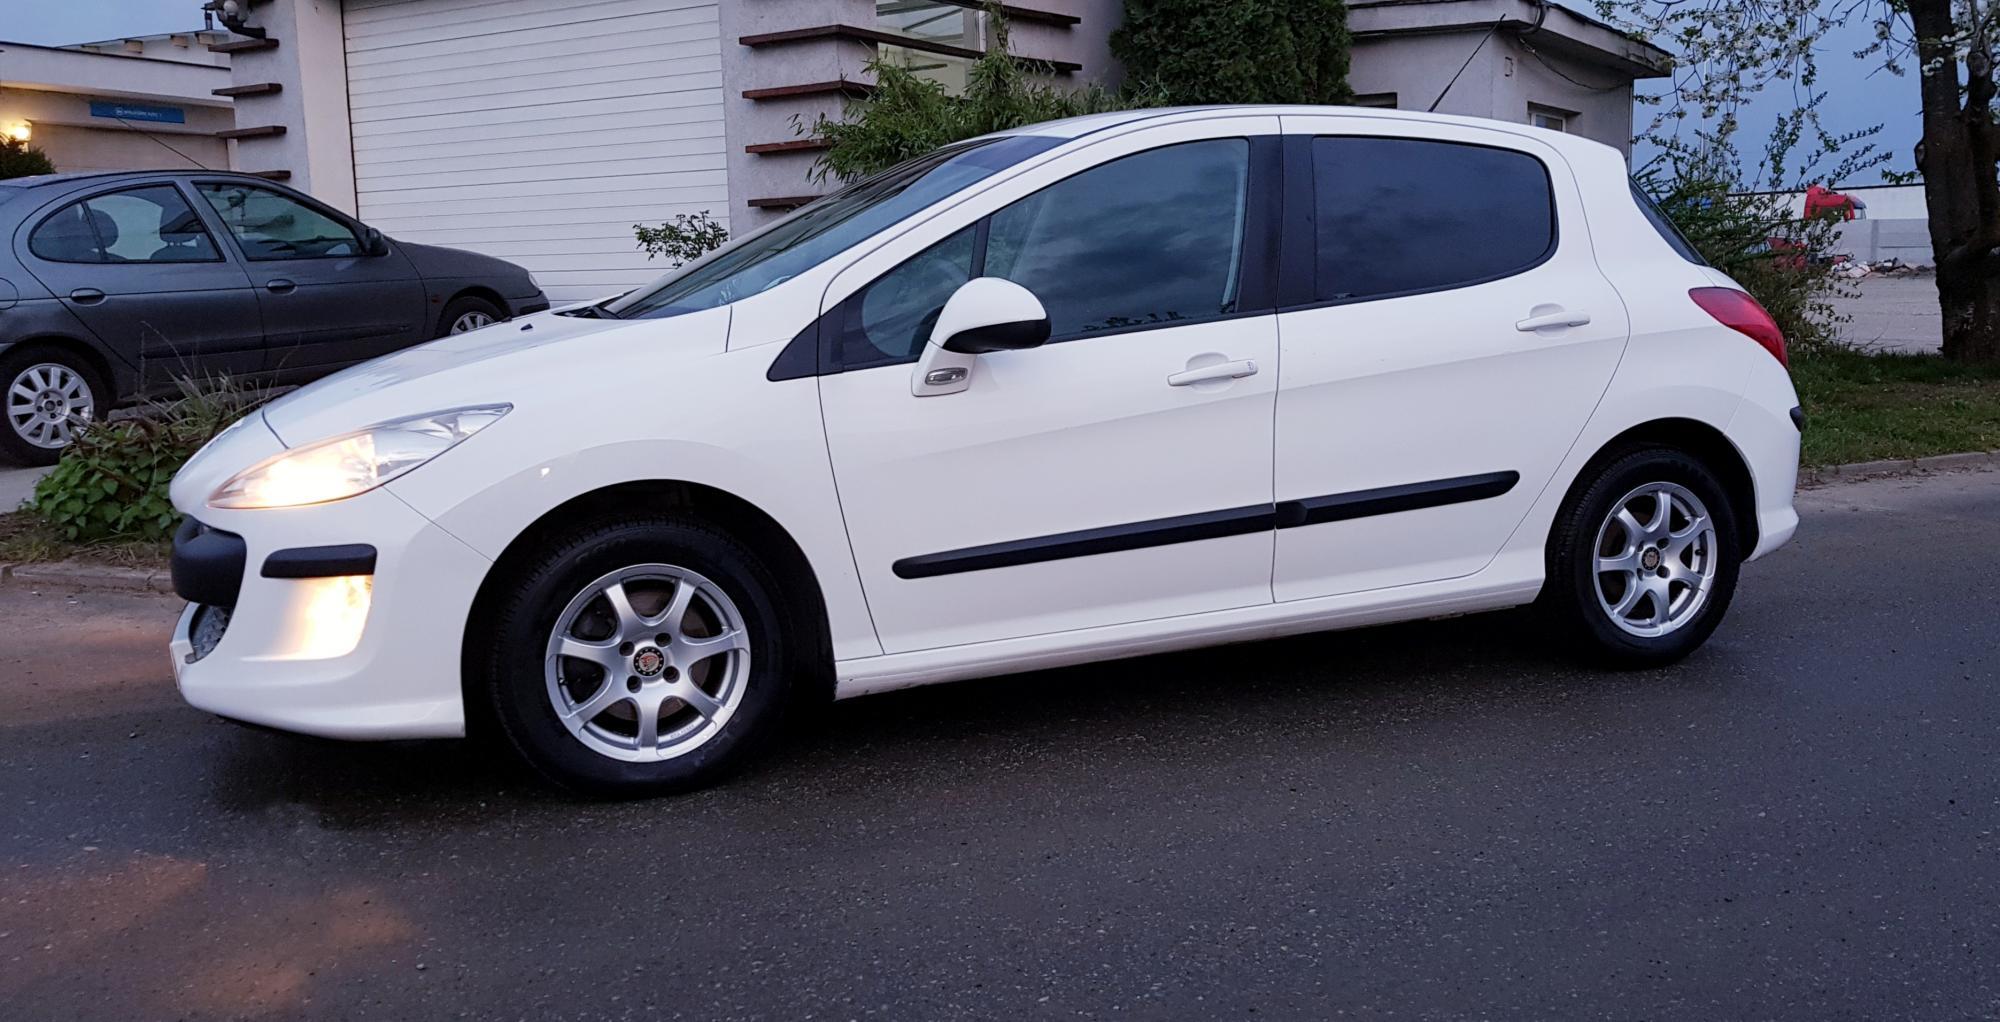 Ce masina ai cumpara cu 5.000 de euro? Peugeot 308, Hyundai i30 sau altceva?